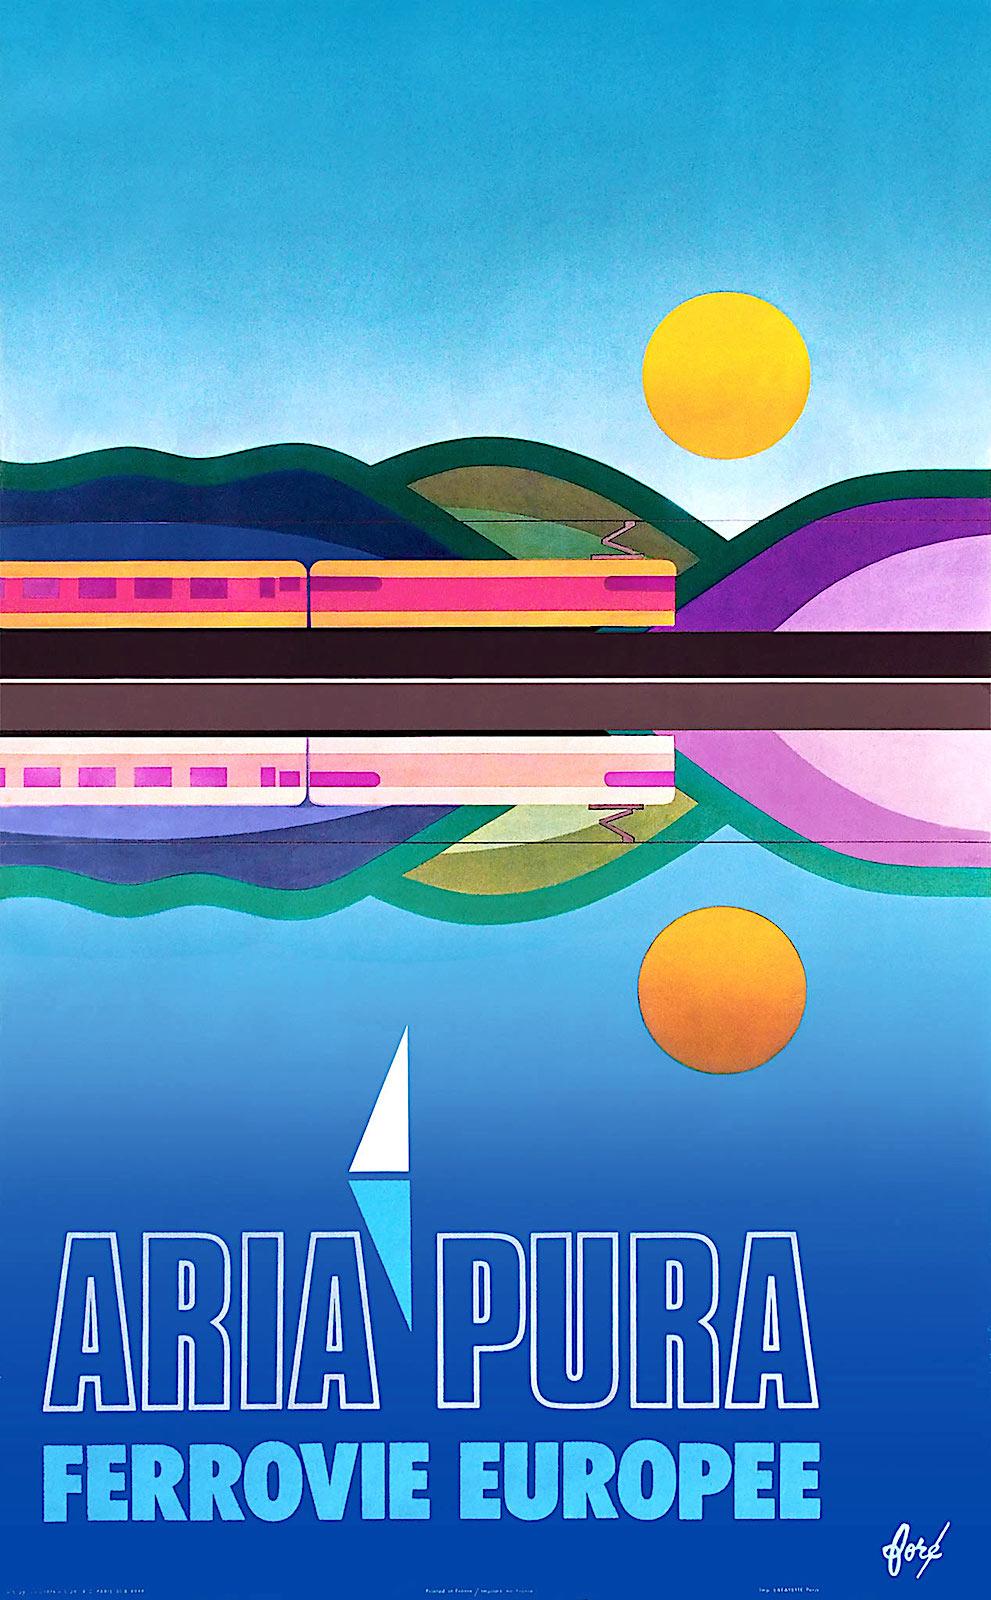 a 1974 travel poster, Ferrovie Europee